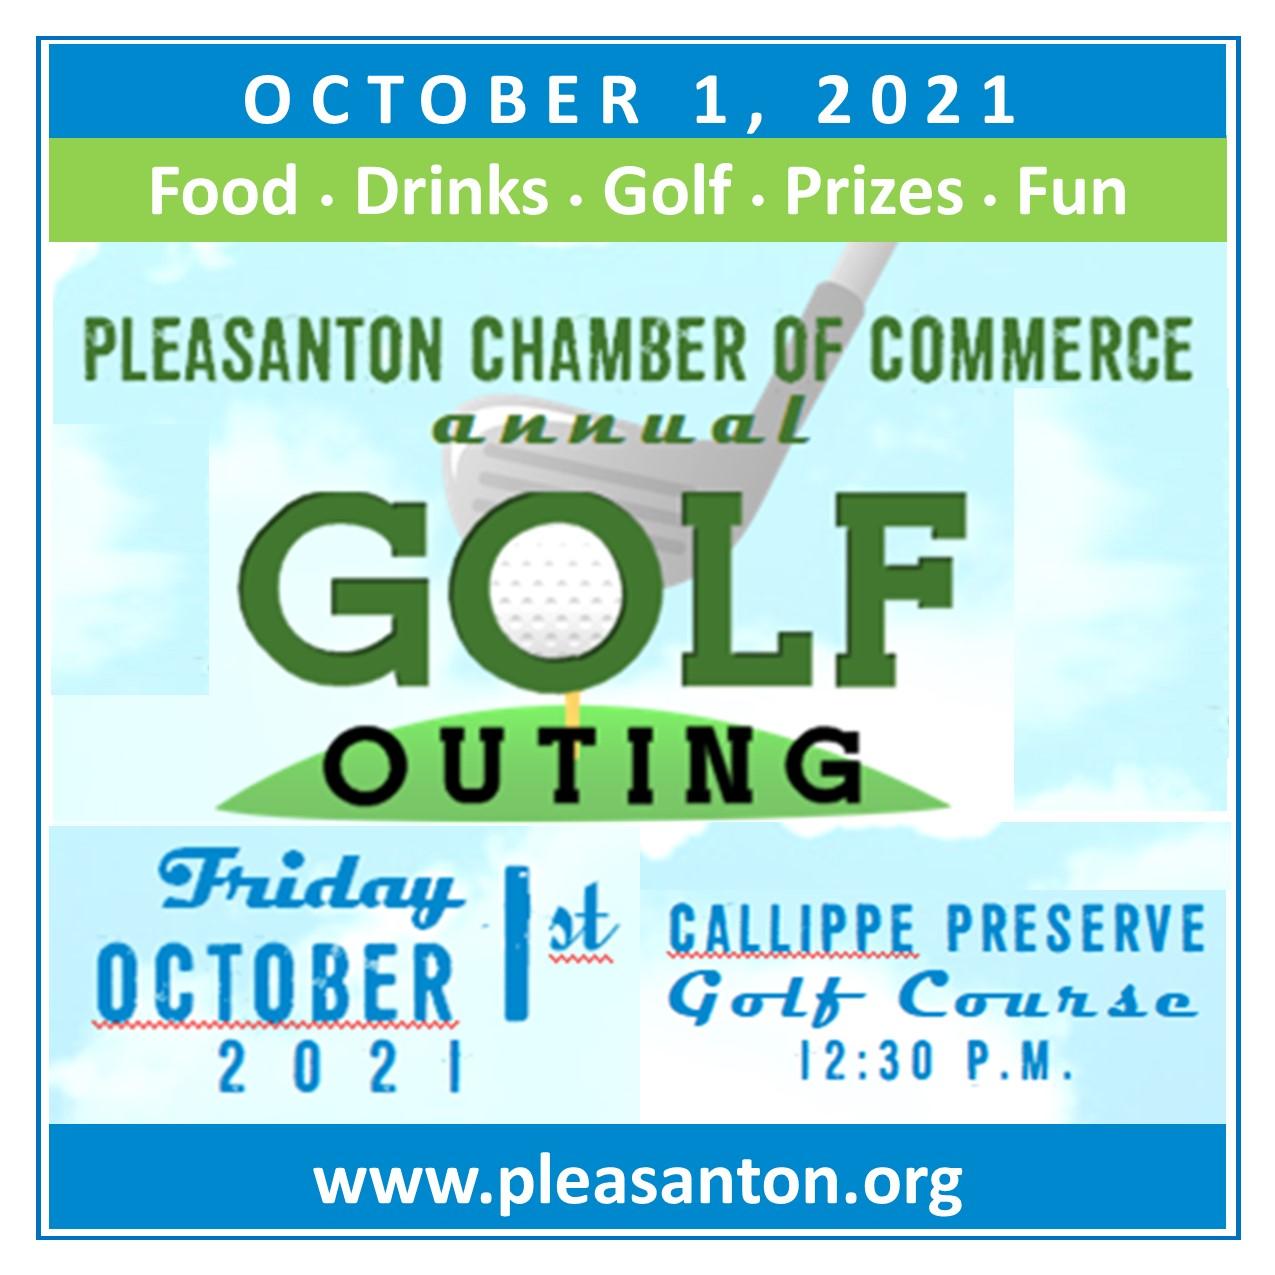 Golf 2021 Square image